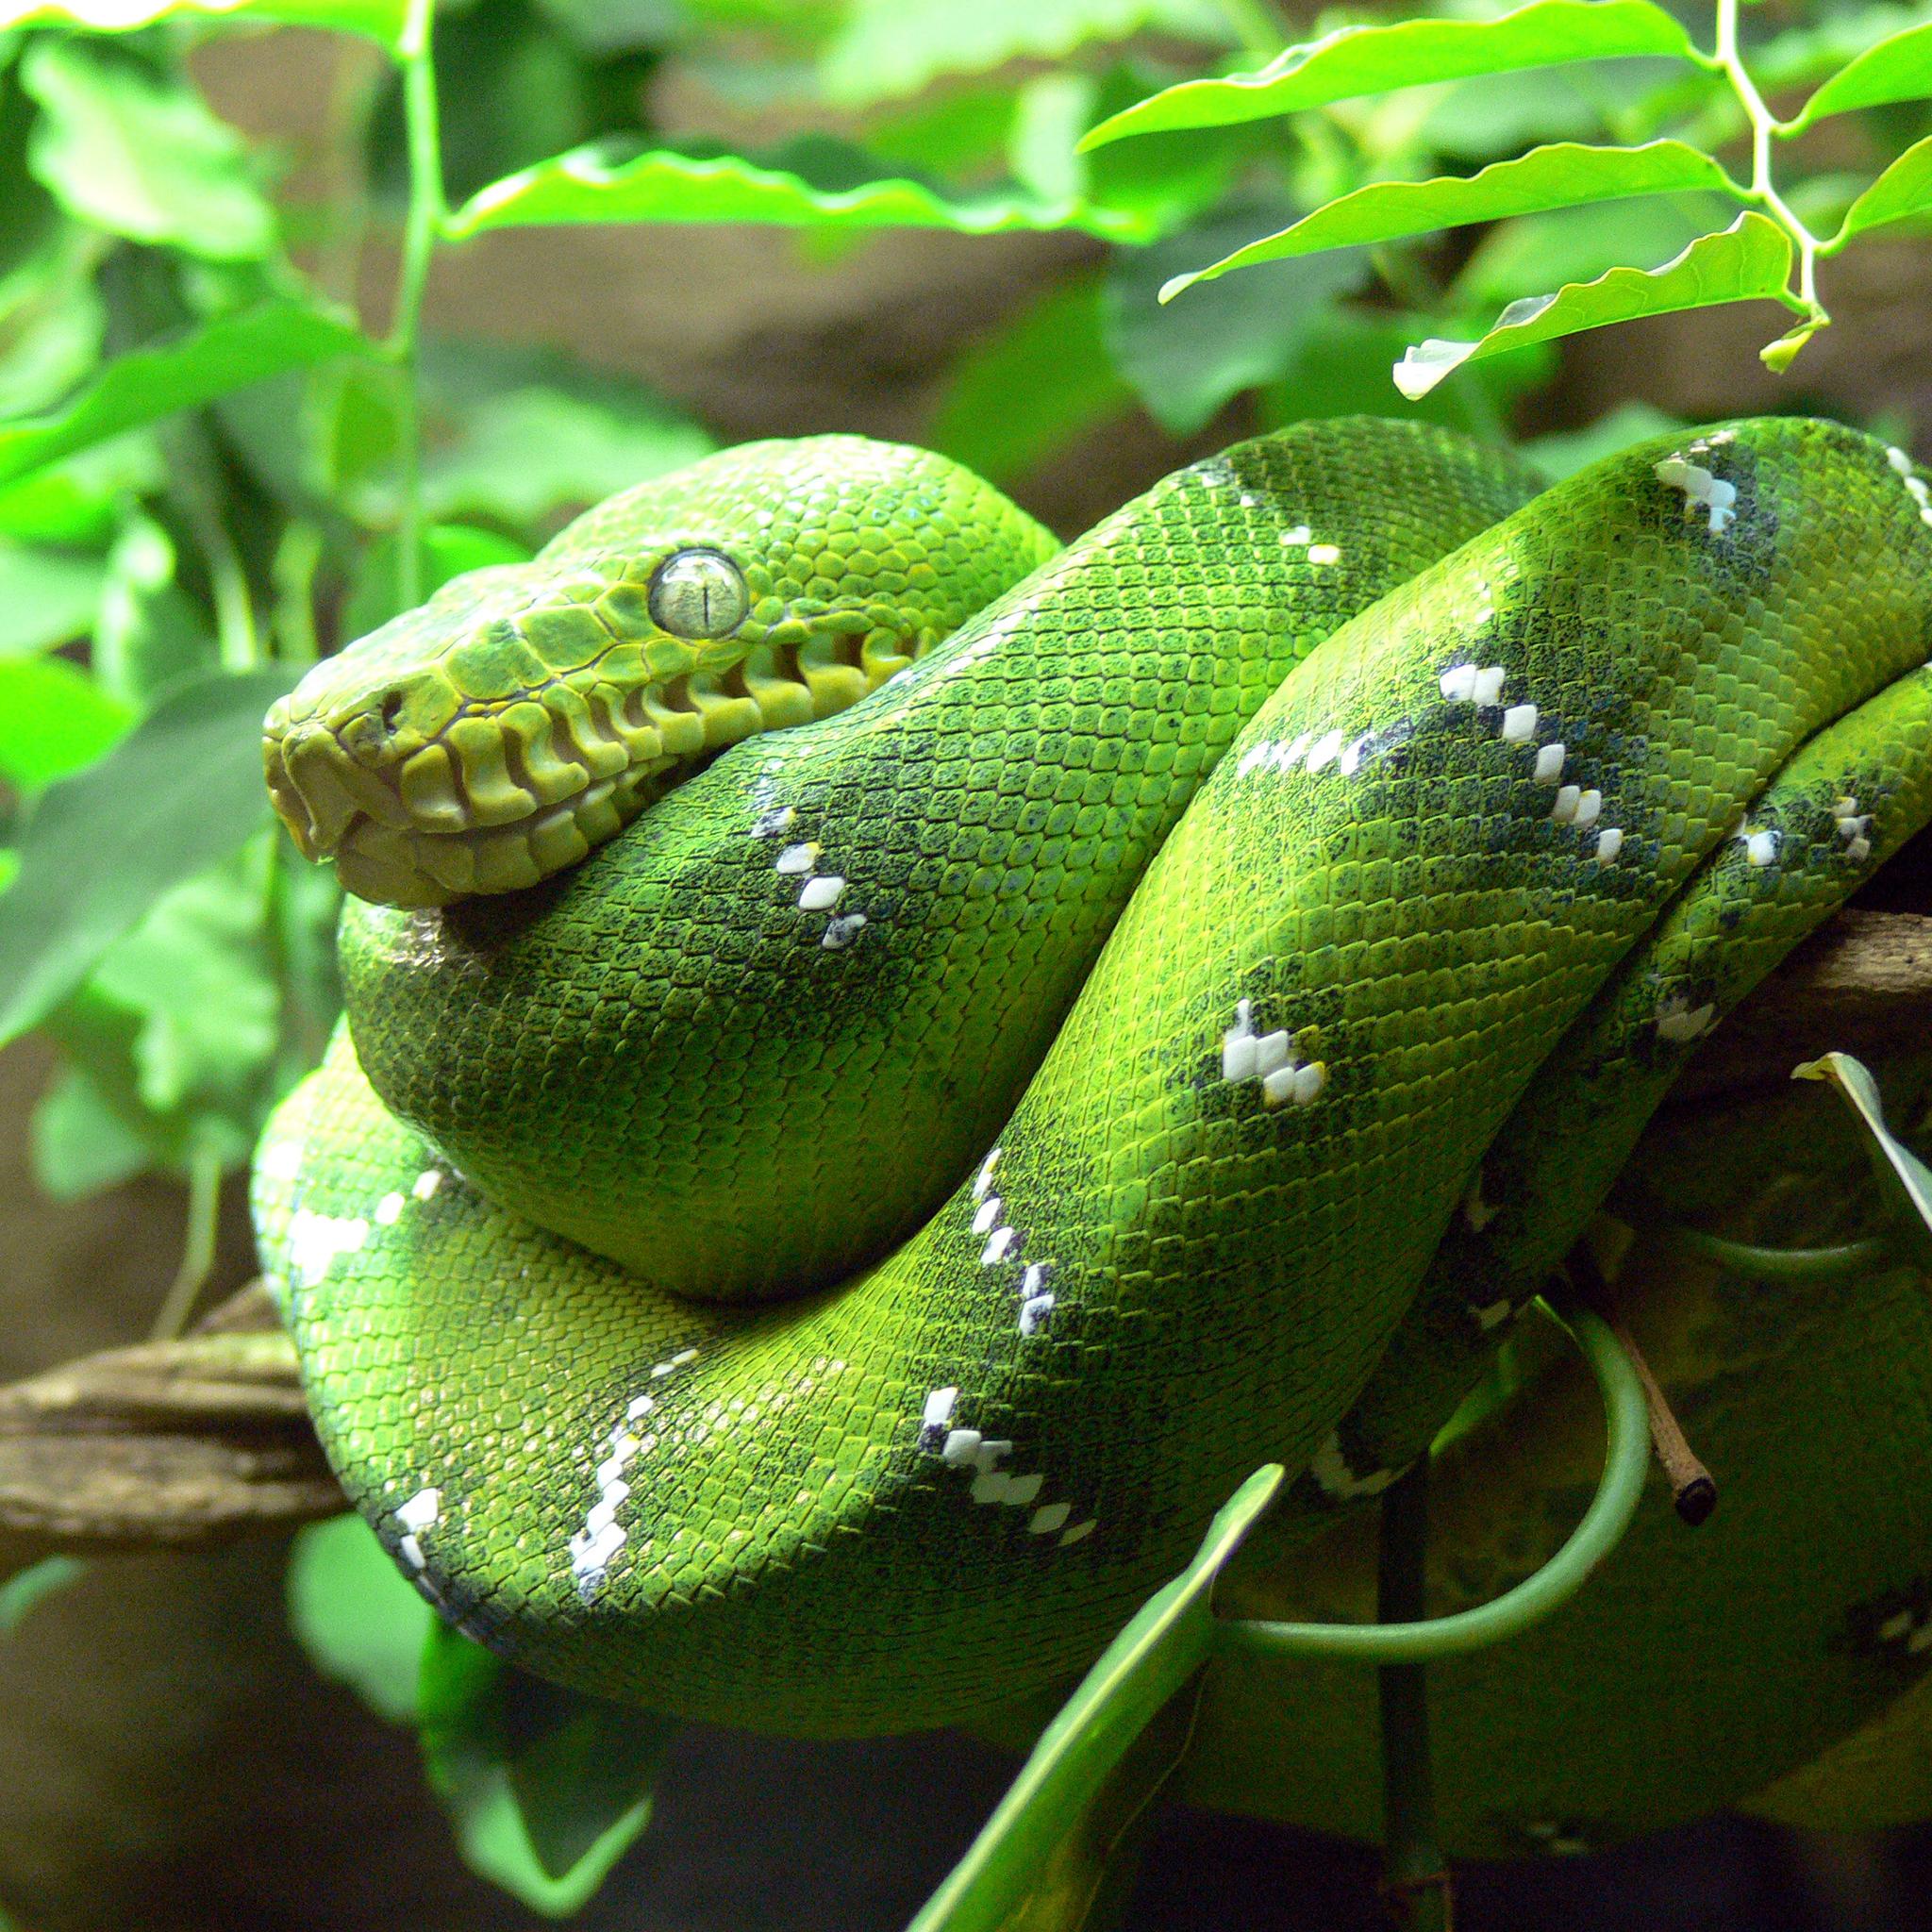 Green Tree Snake3Wallpapers iPad Retina Green Tree Snake   iPad Retina